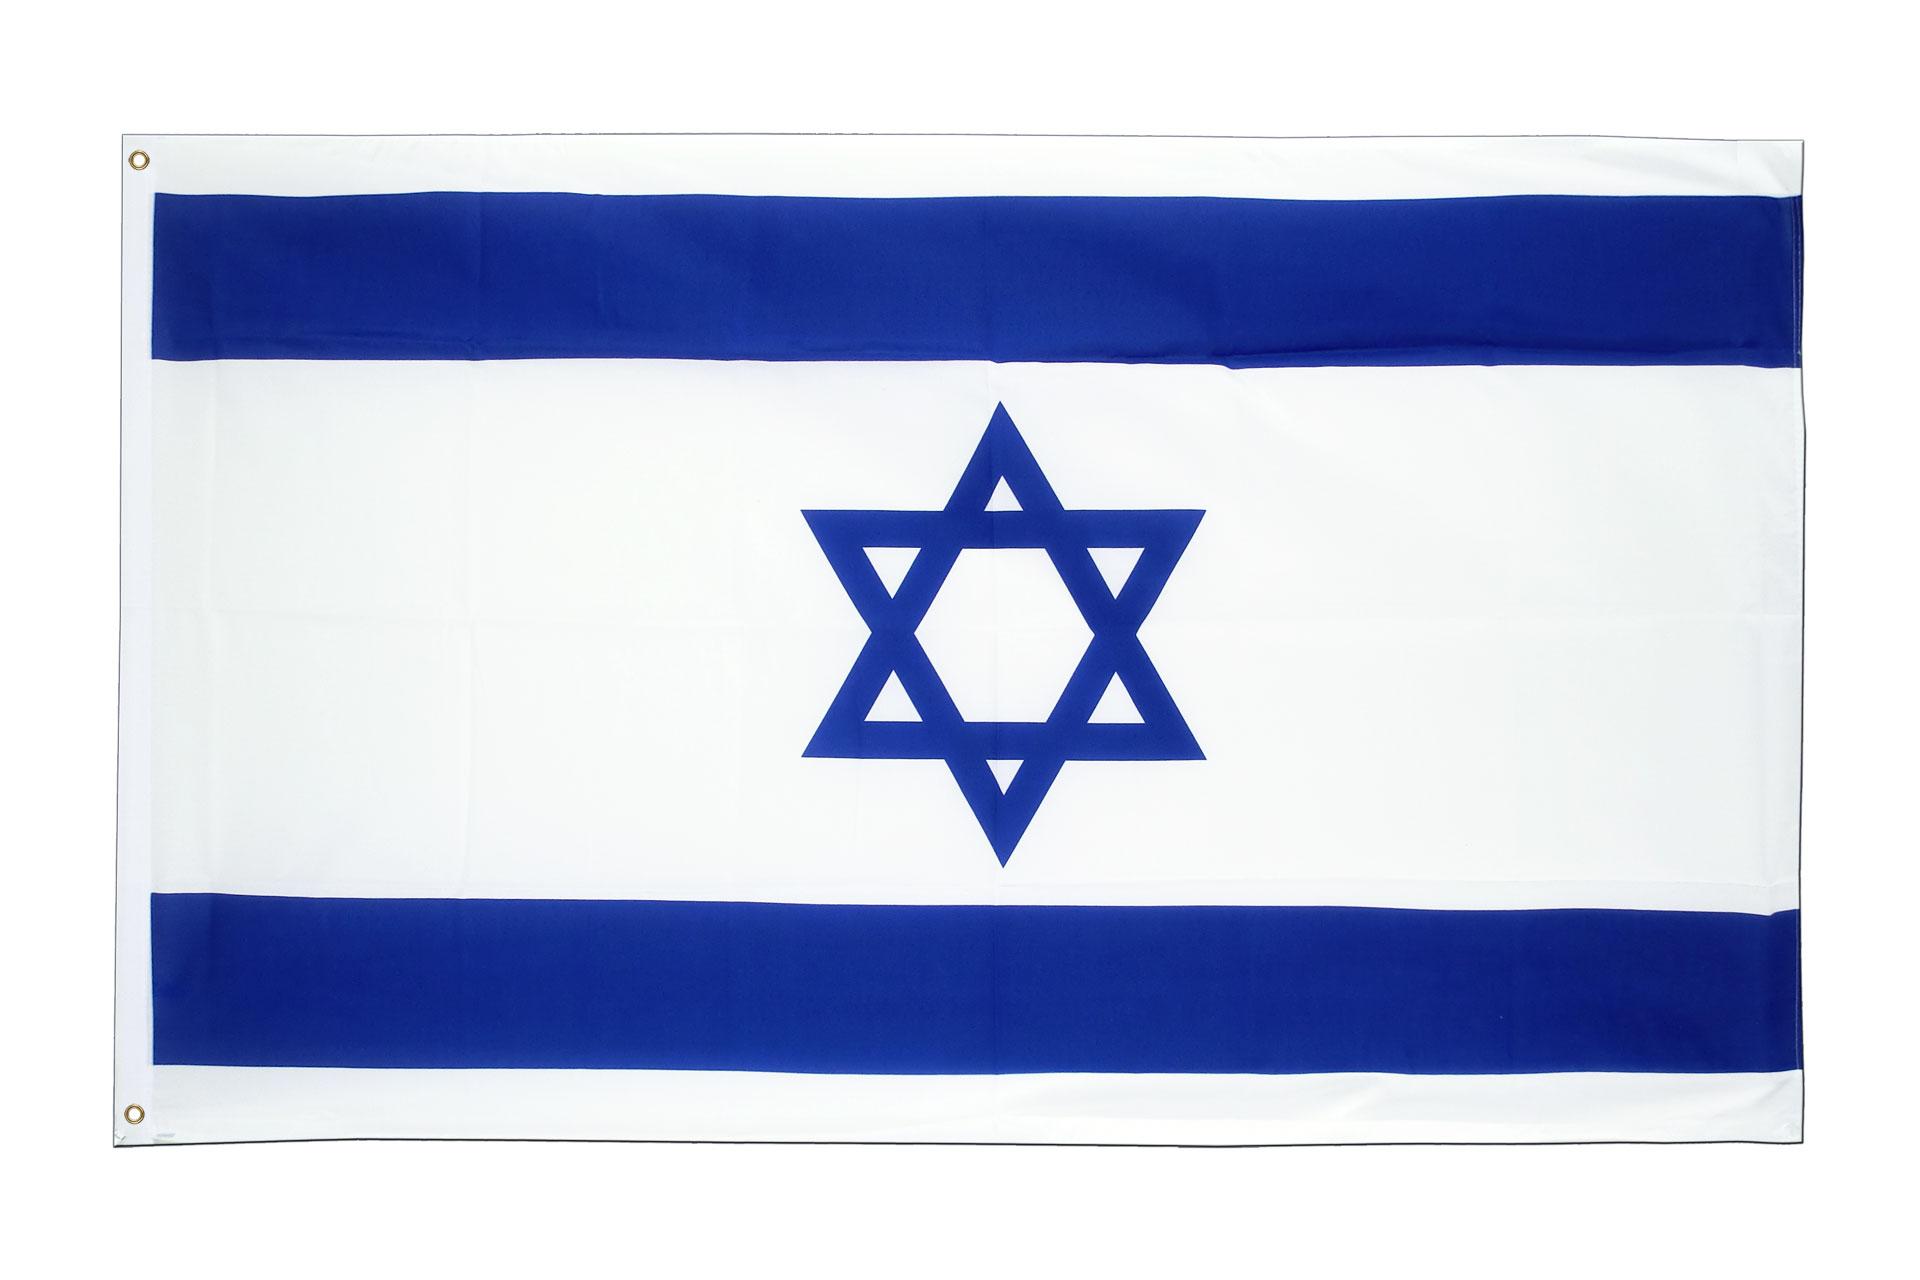 Buy Israel Flag - 3x5 ft (90x150 cm) - Royal-Flags